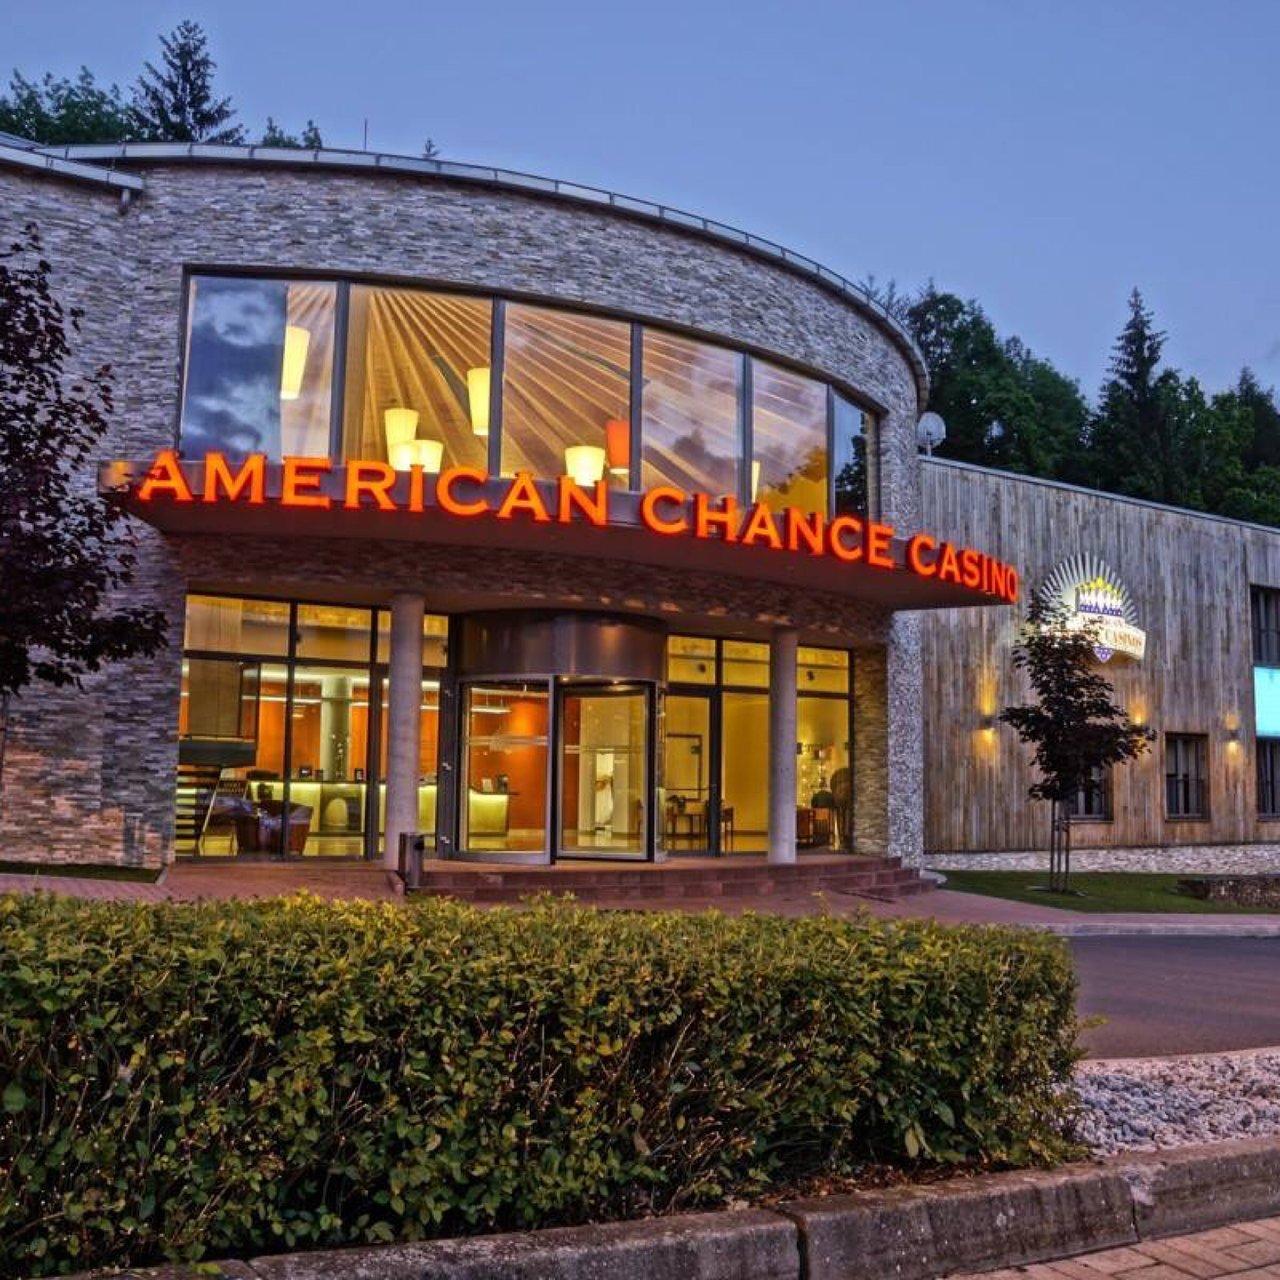 american chance casino